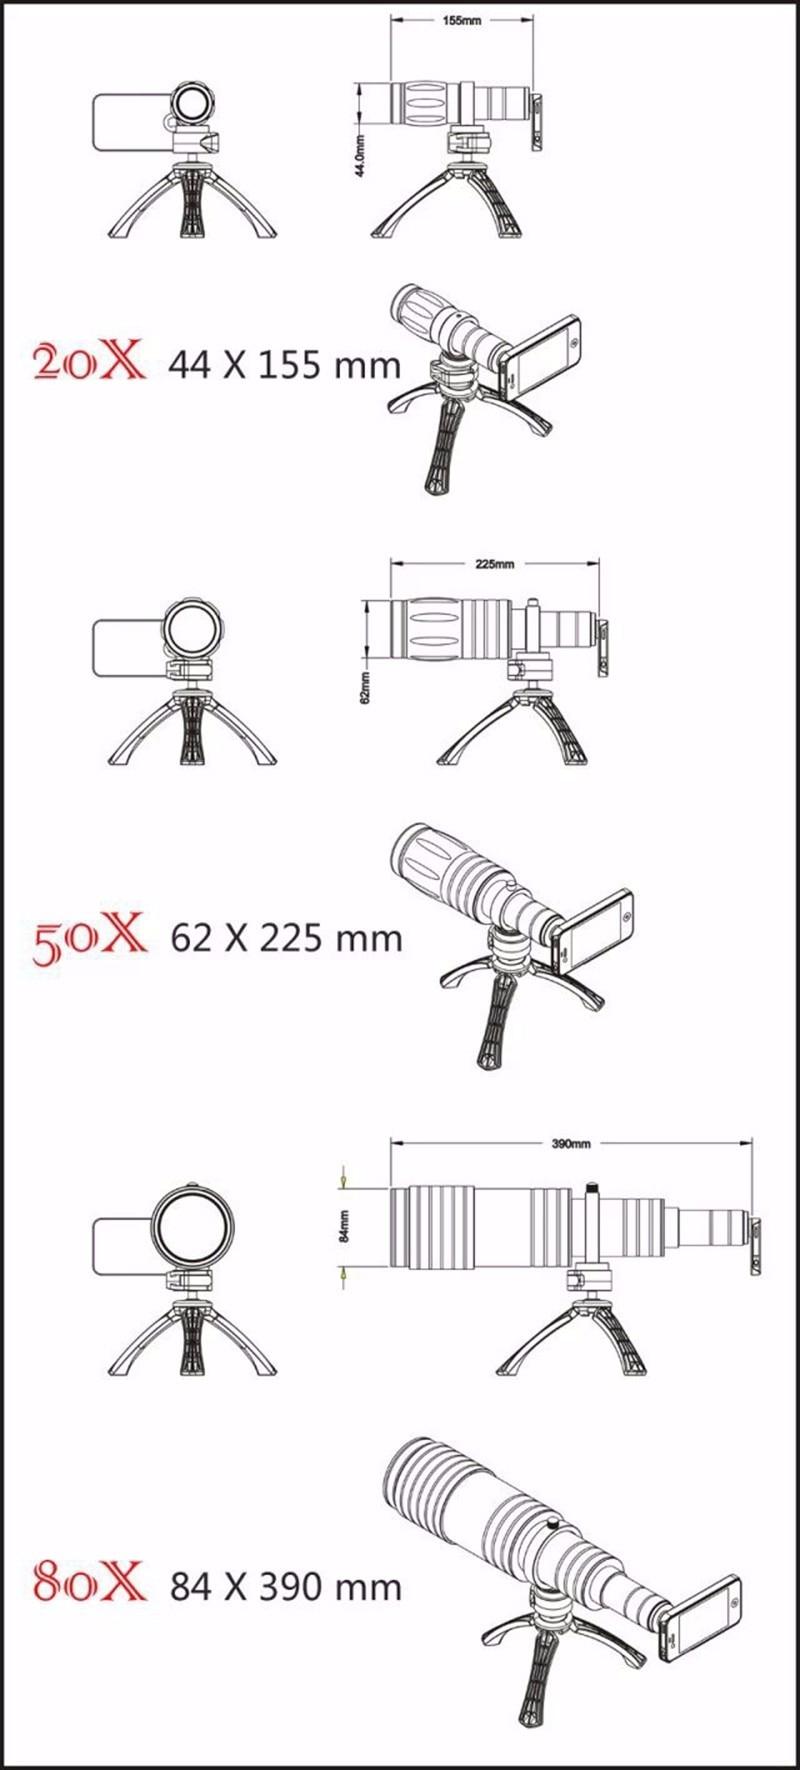 HD Universal 80X Telephoto Zoom Optical Len telescope Mobile Phone Camera kit with tripod Ikeacasa Free Shipping